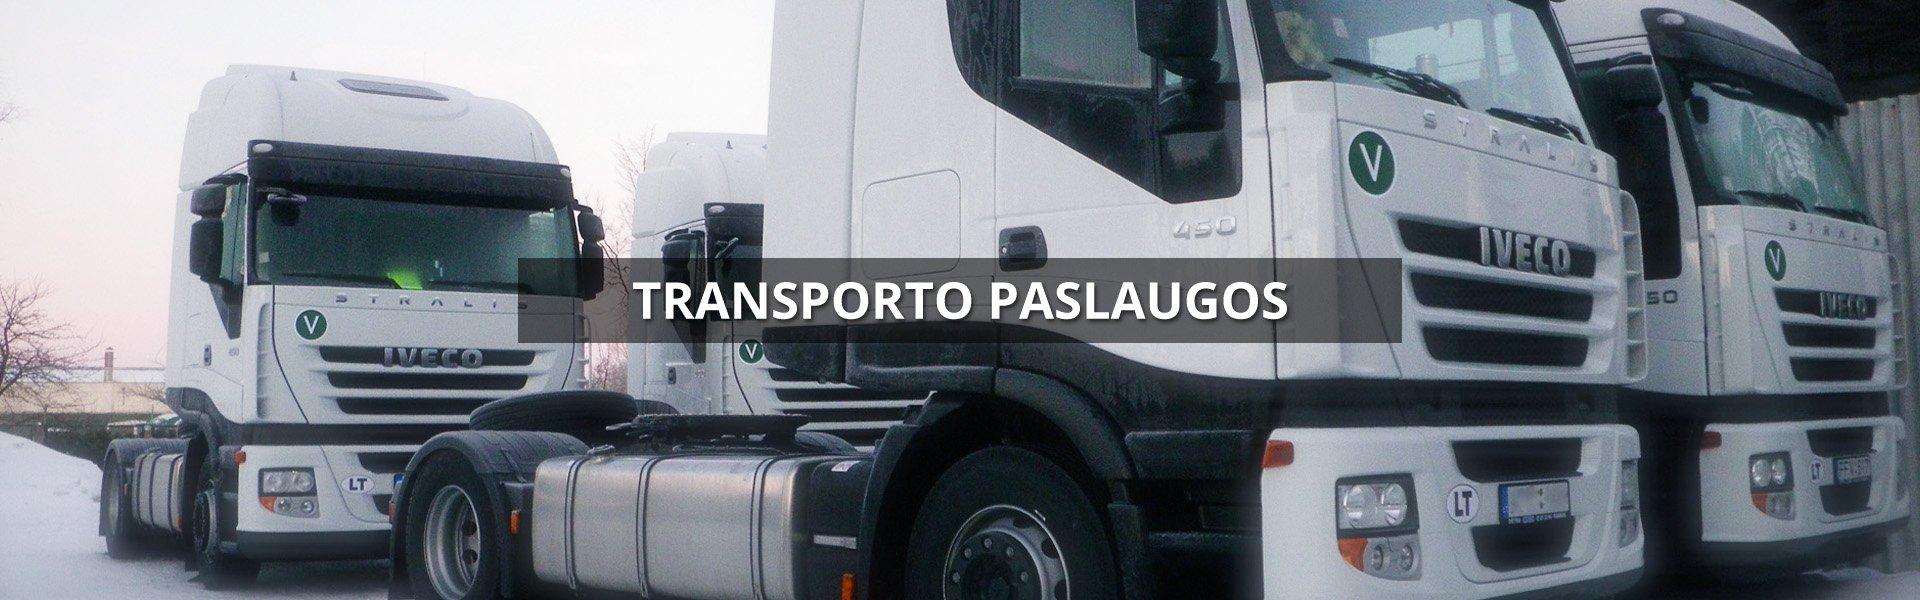 Naideka transporto paslaugos